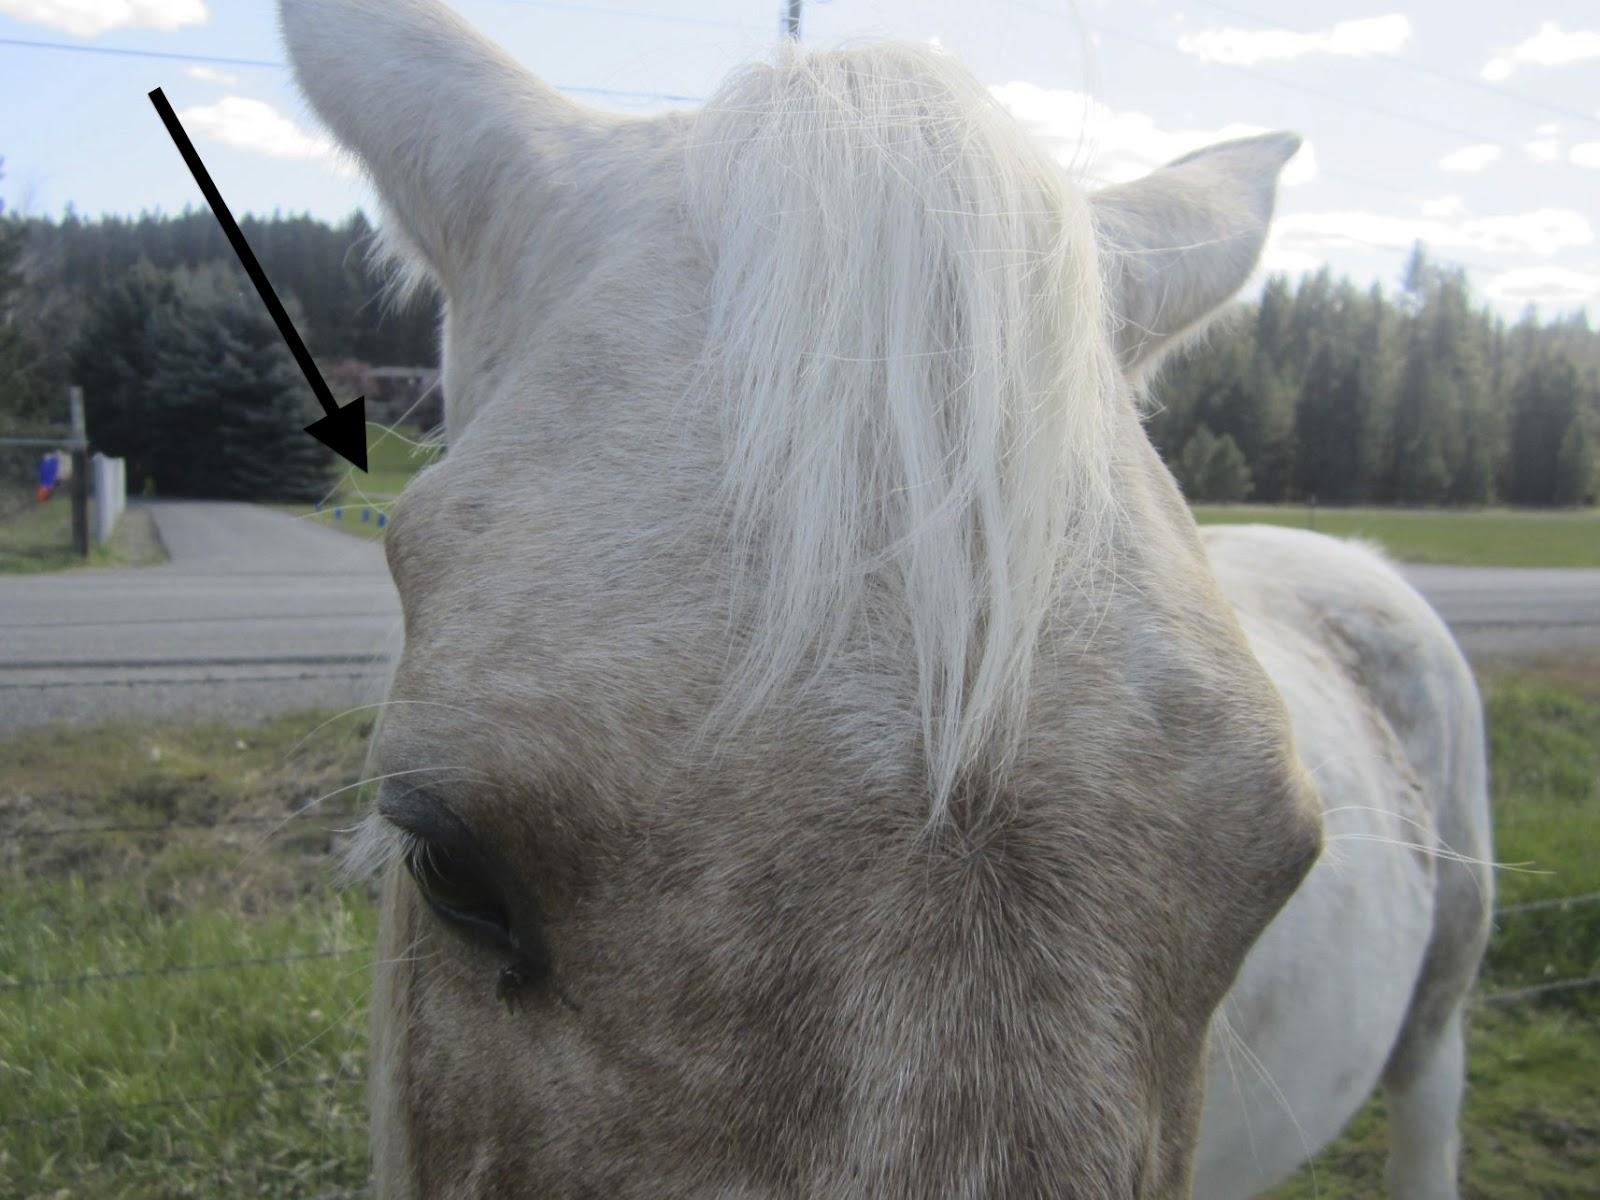 Equine Masterpiece: Anatomy: Horns